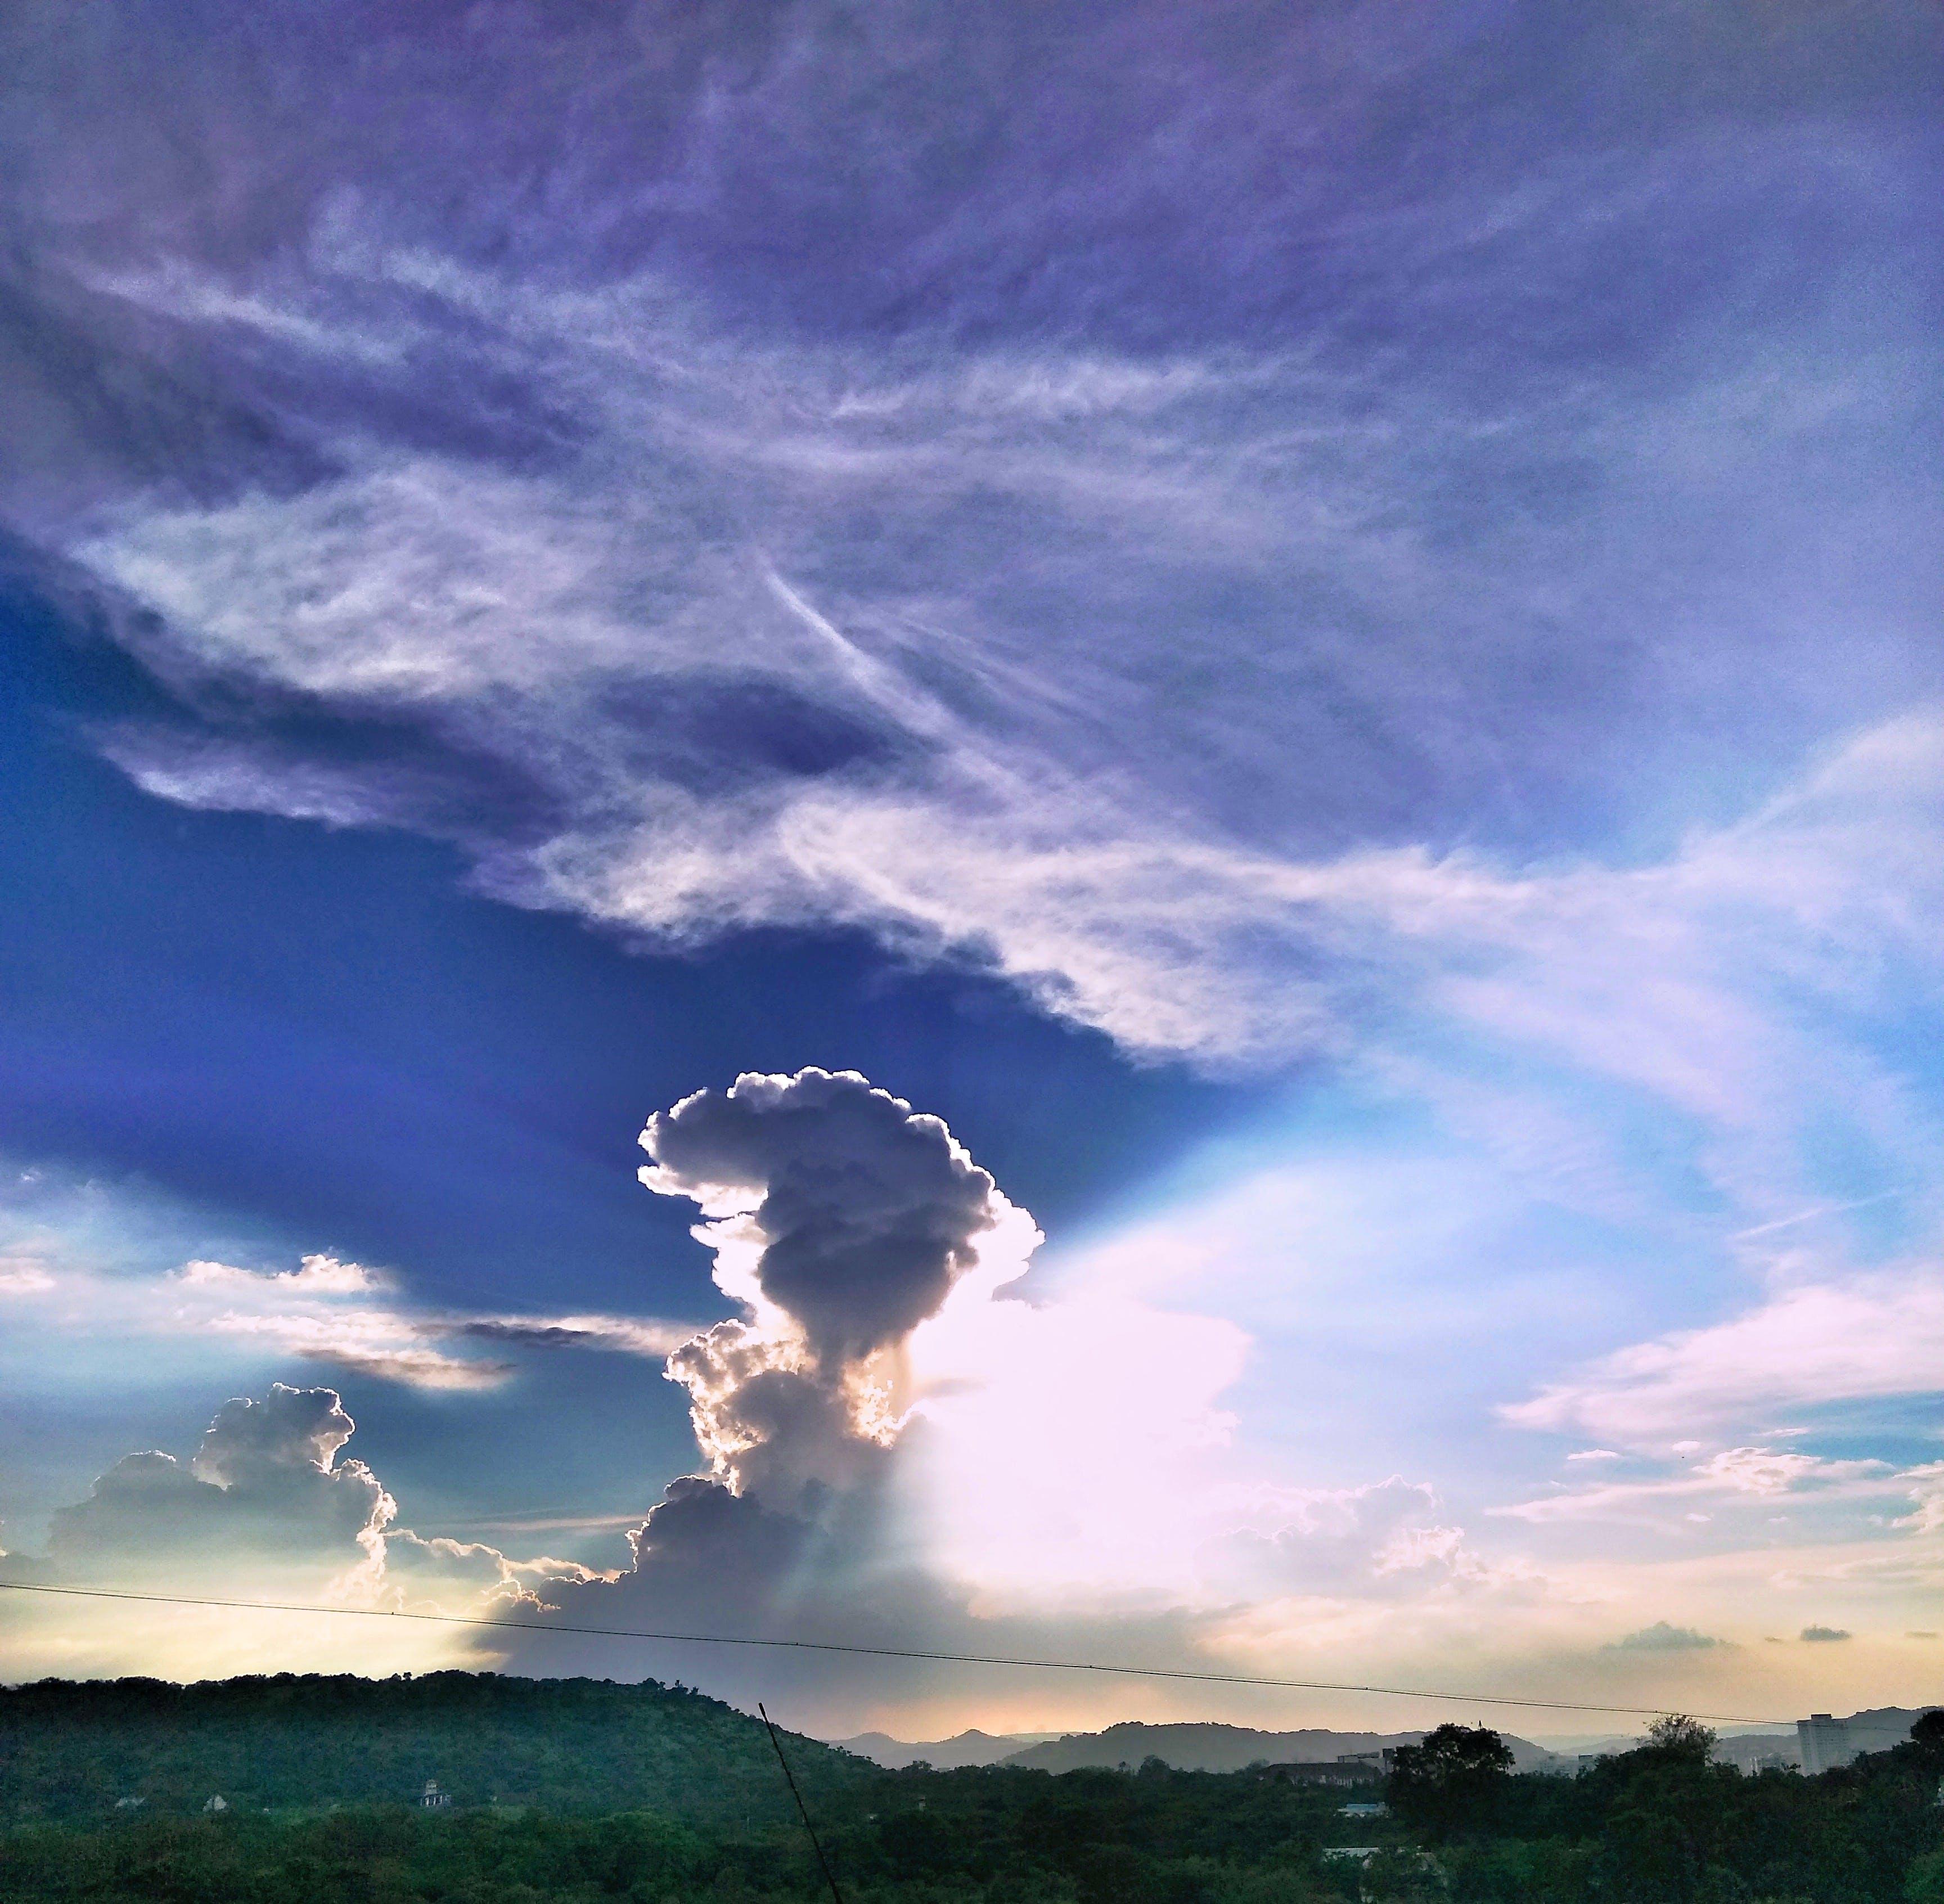 Gratis stockfoto met blauw, cloudscape, daglicht, hemel